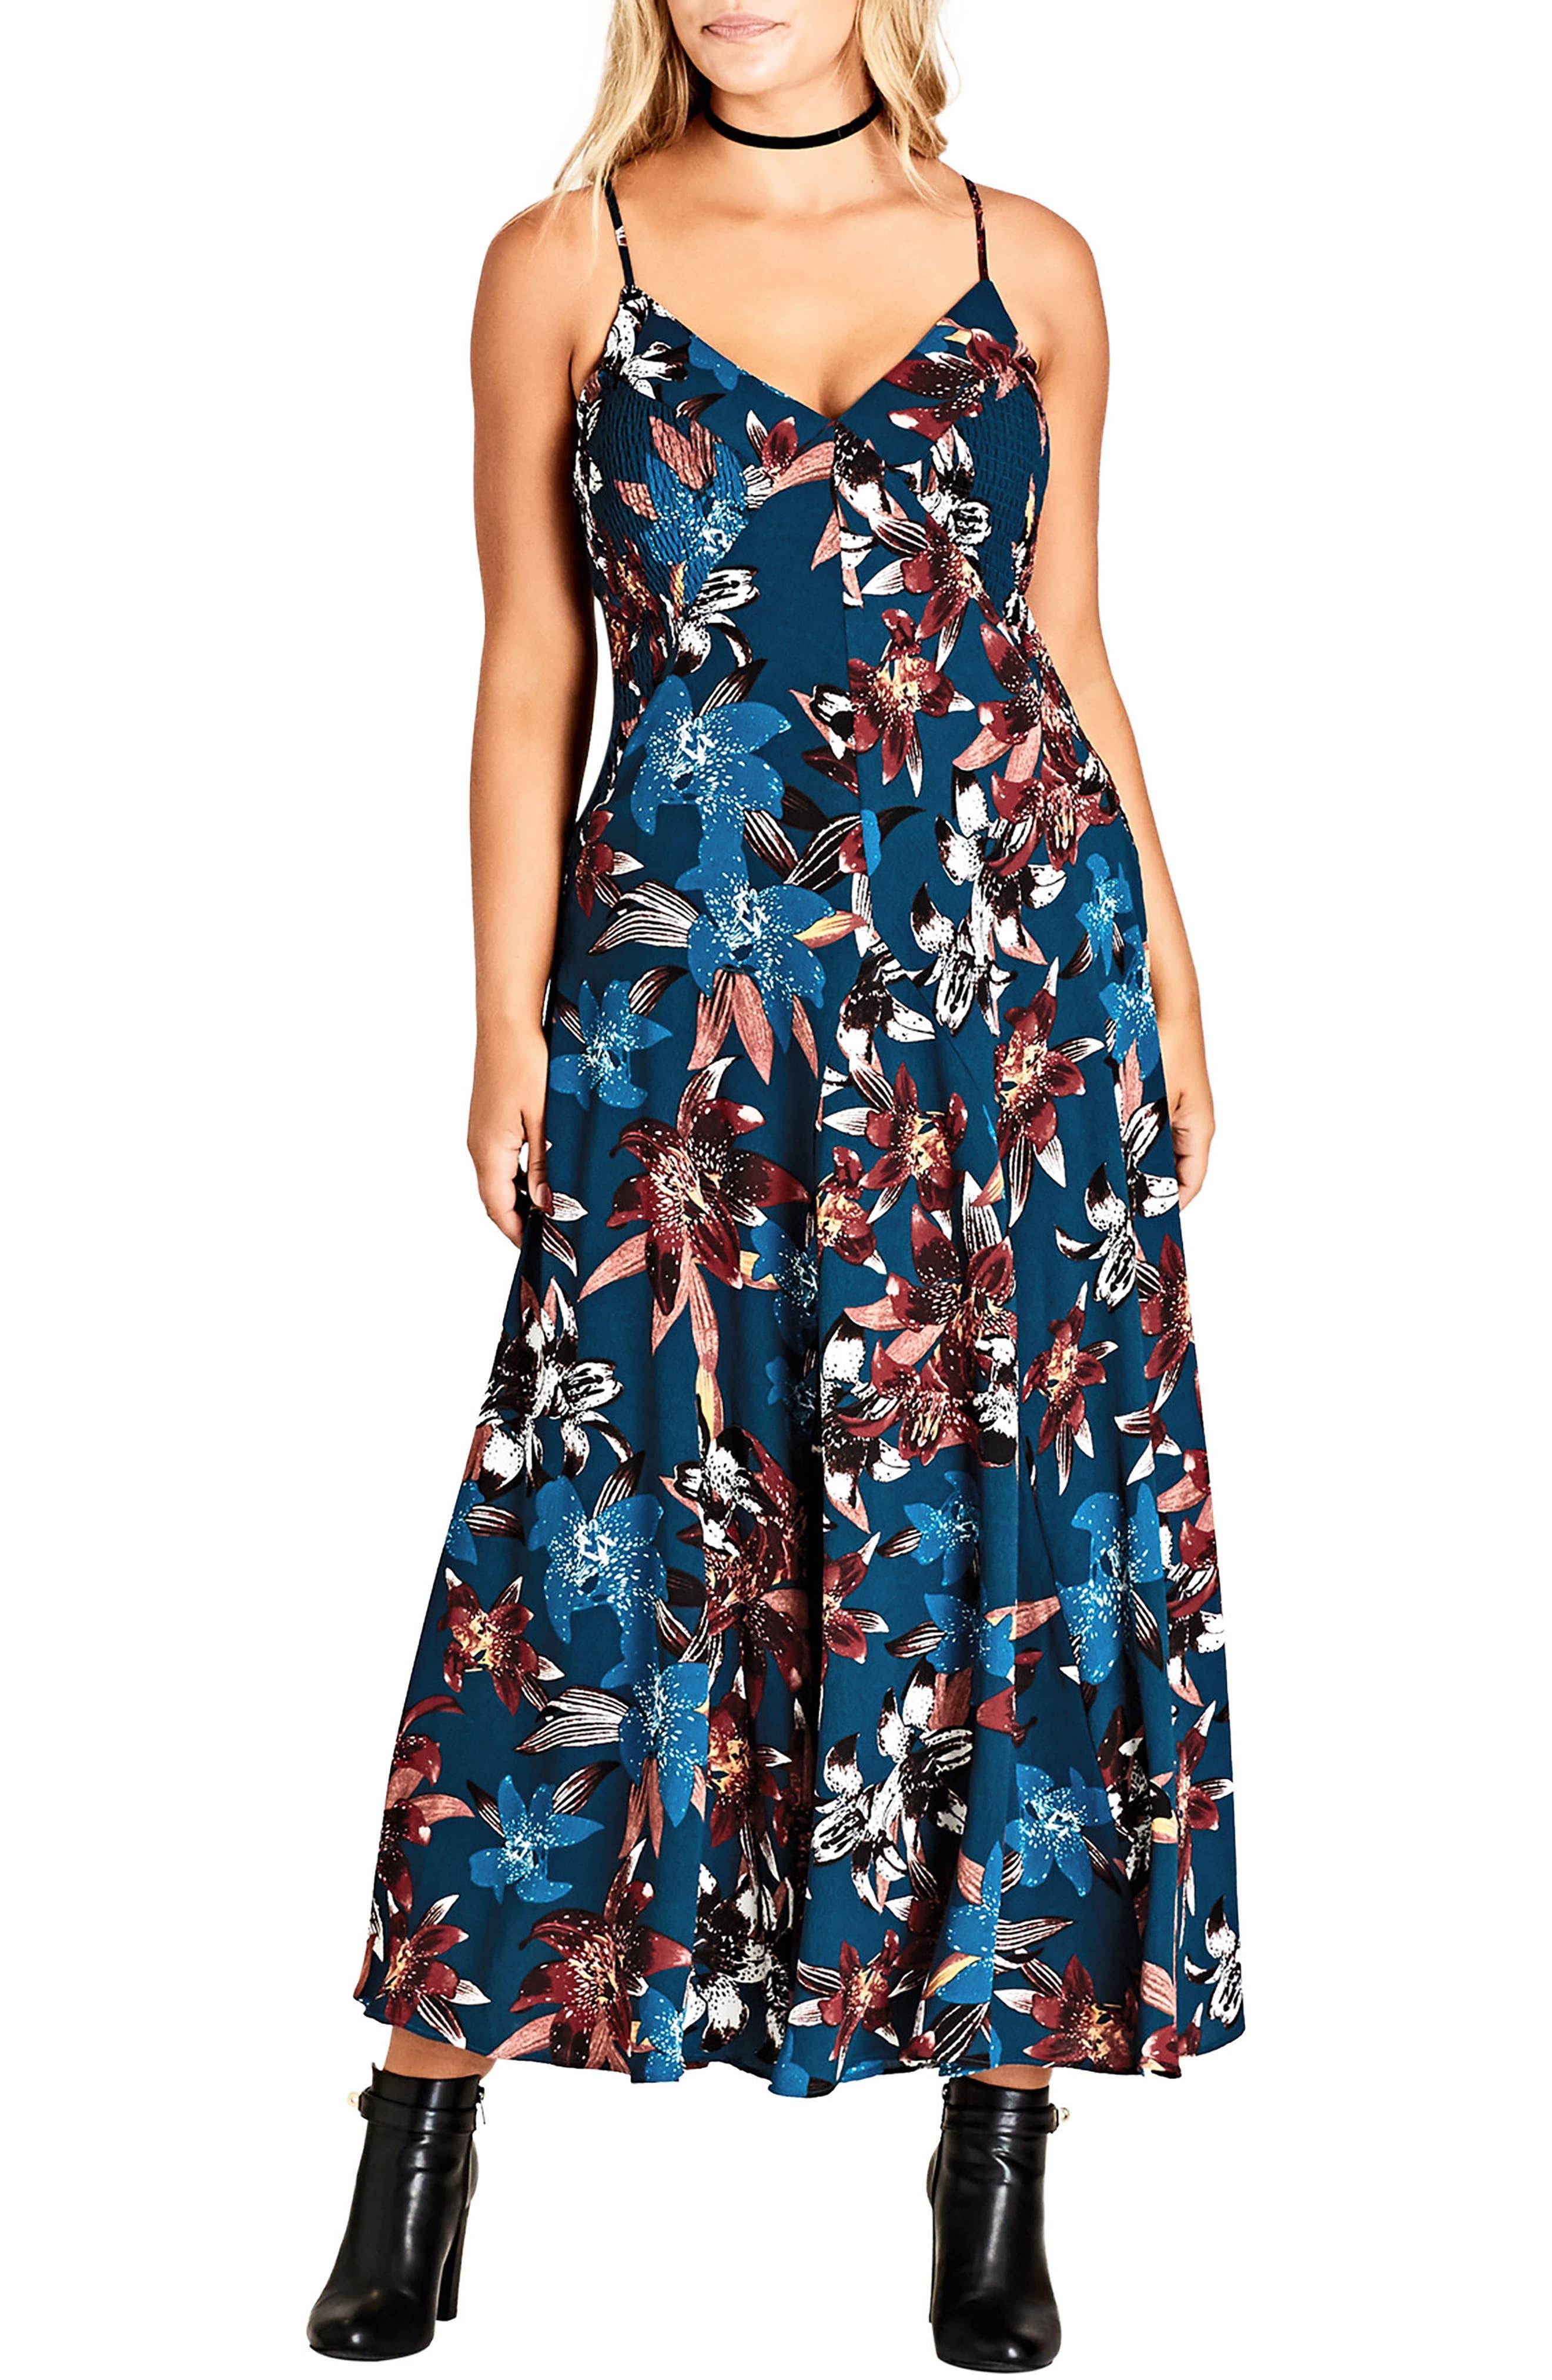 Fall Lily Maxi Dress,                         Main,                         color, 414